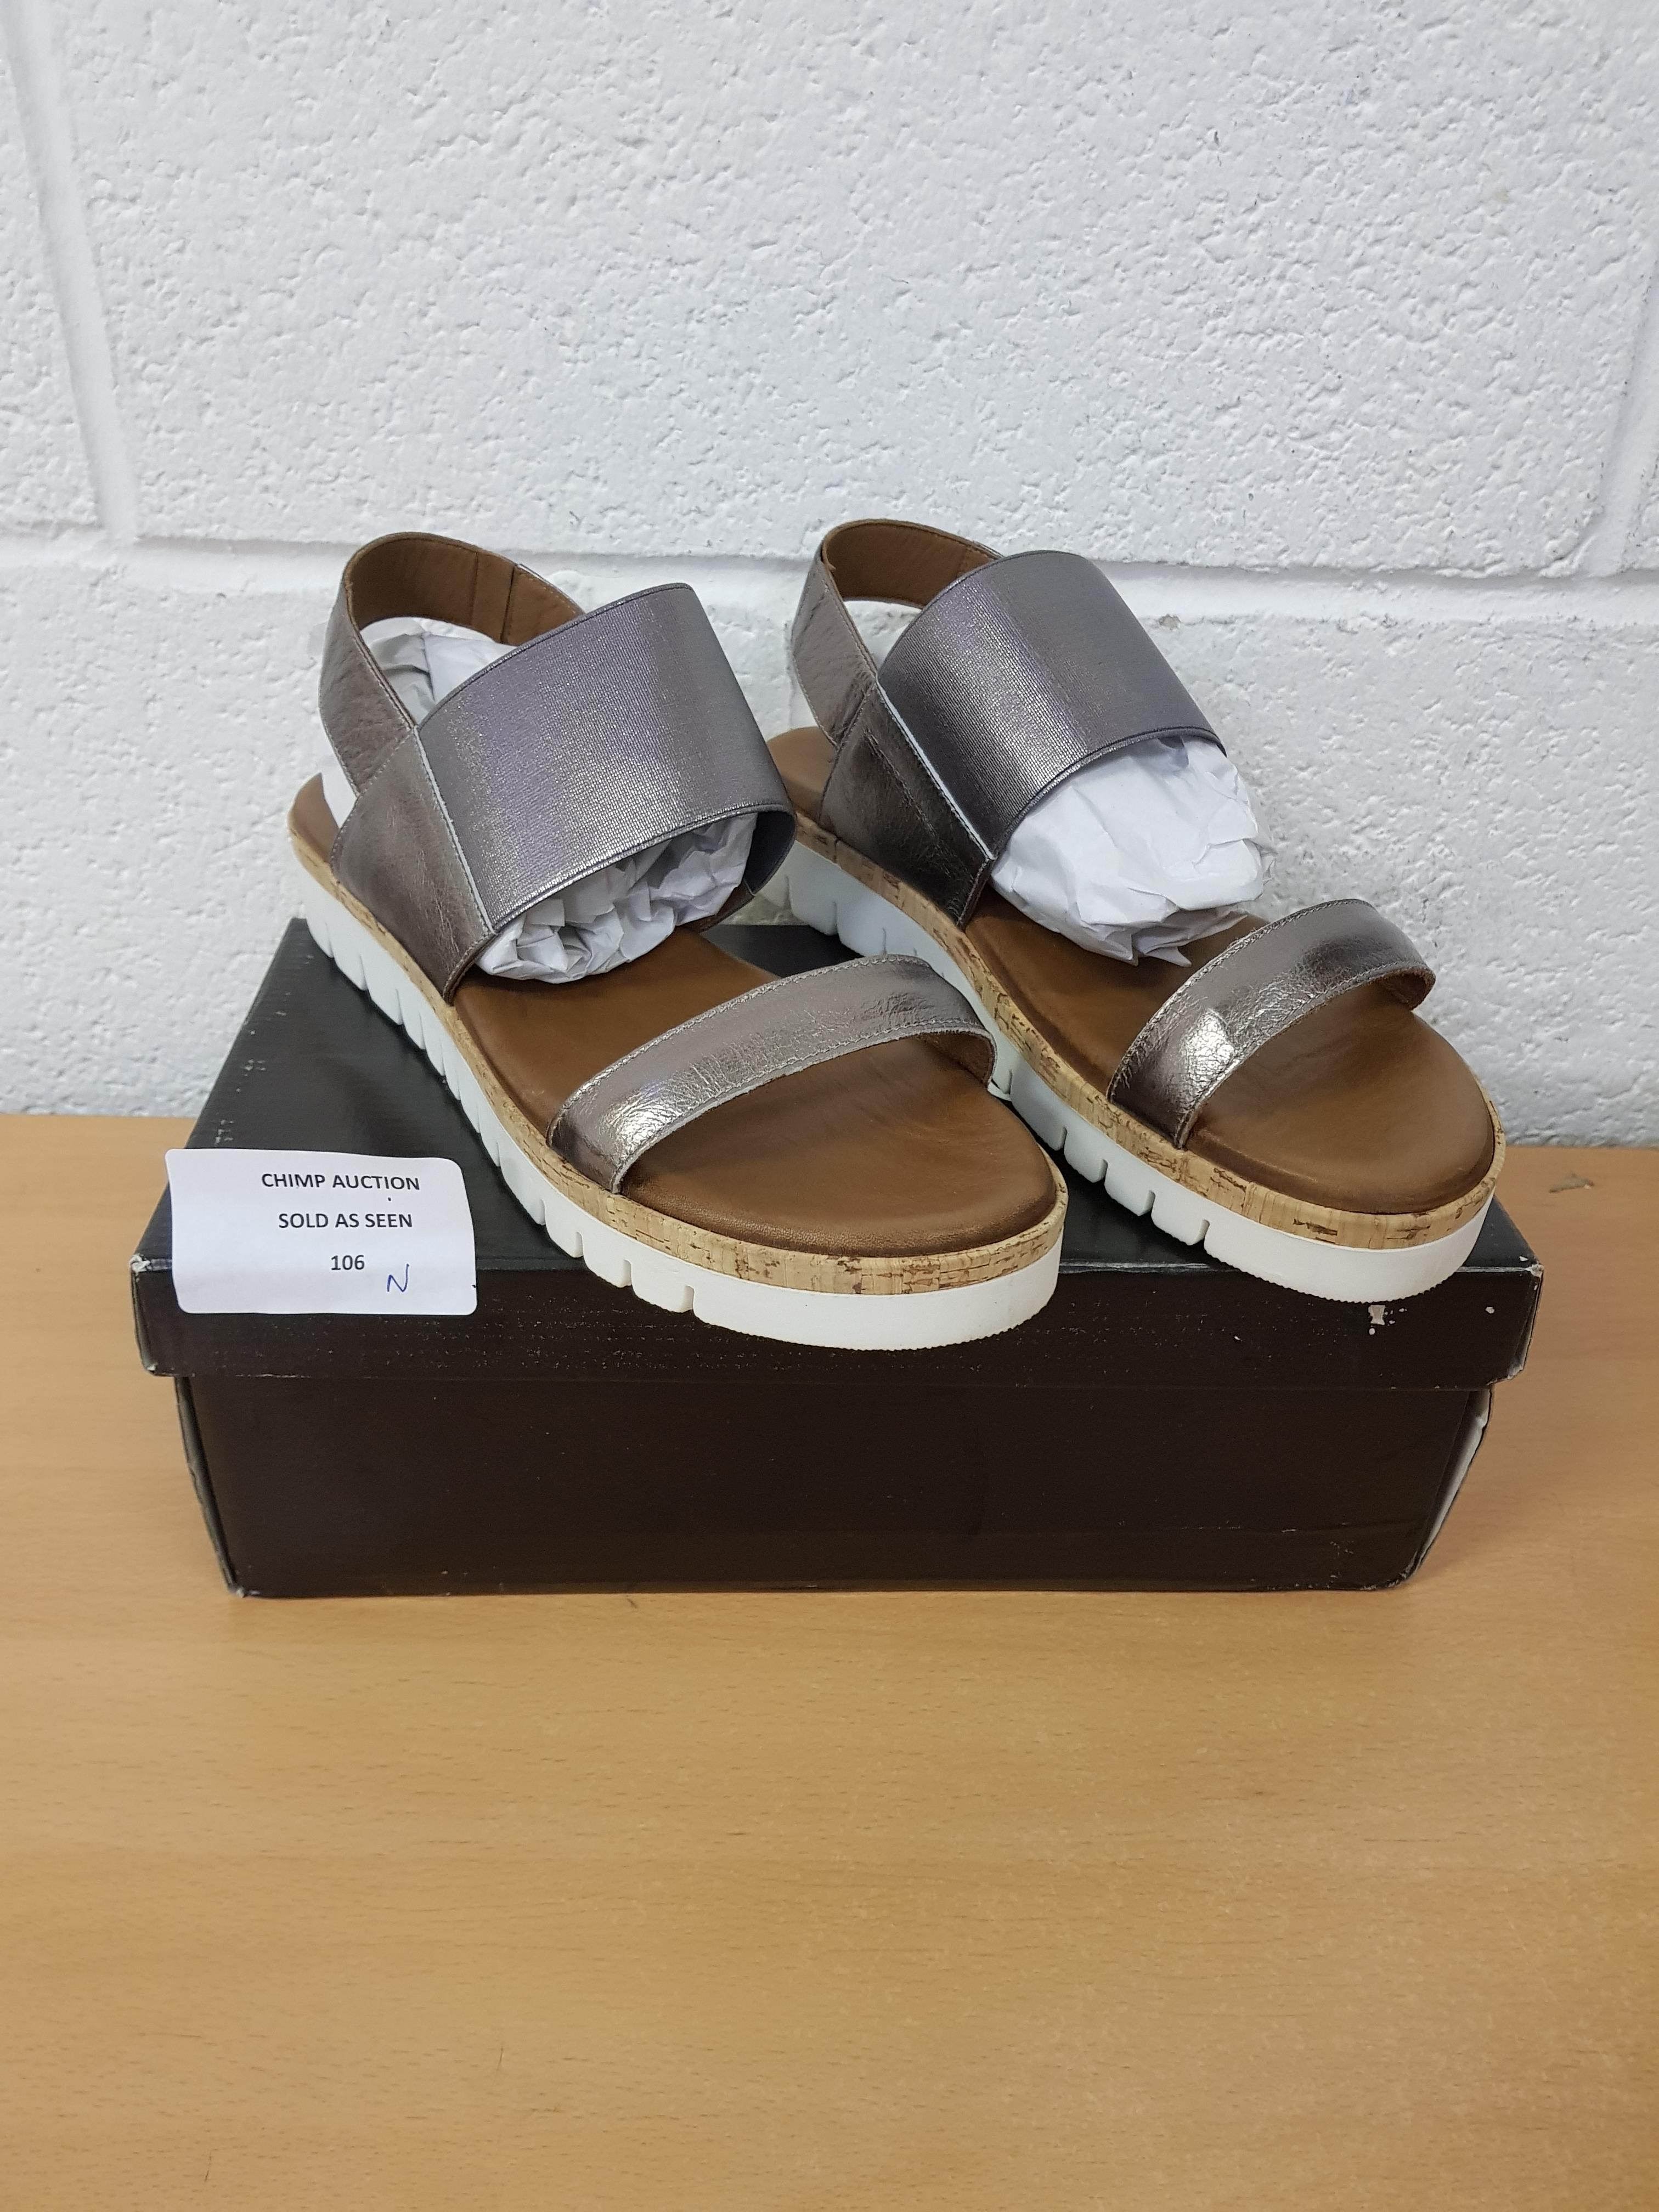 Lot 106 - Brand new Inuovo ladies sandals EU 41